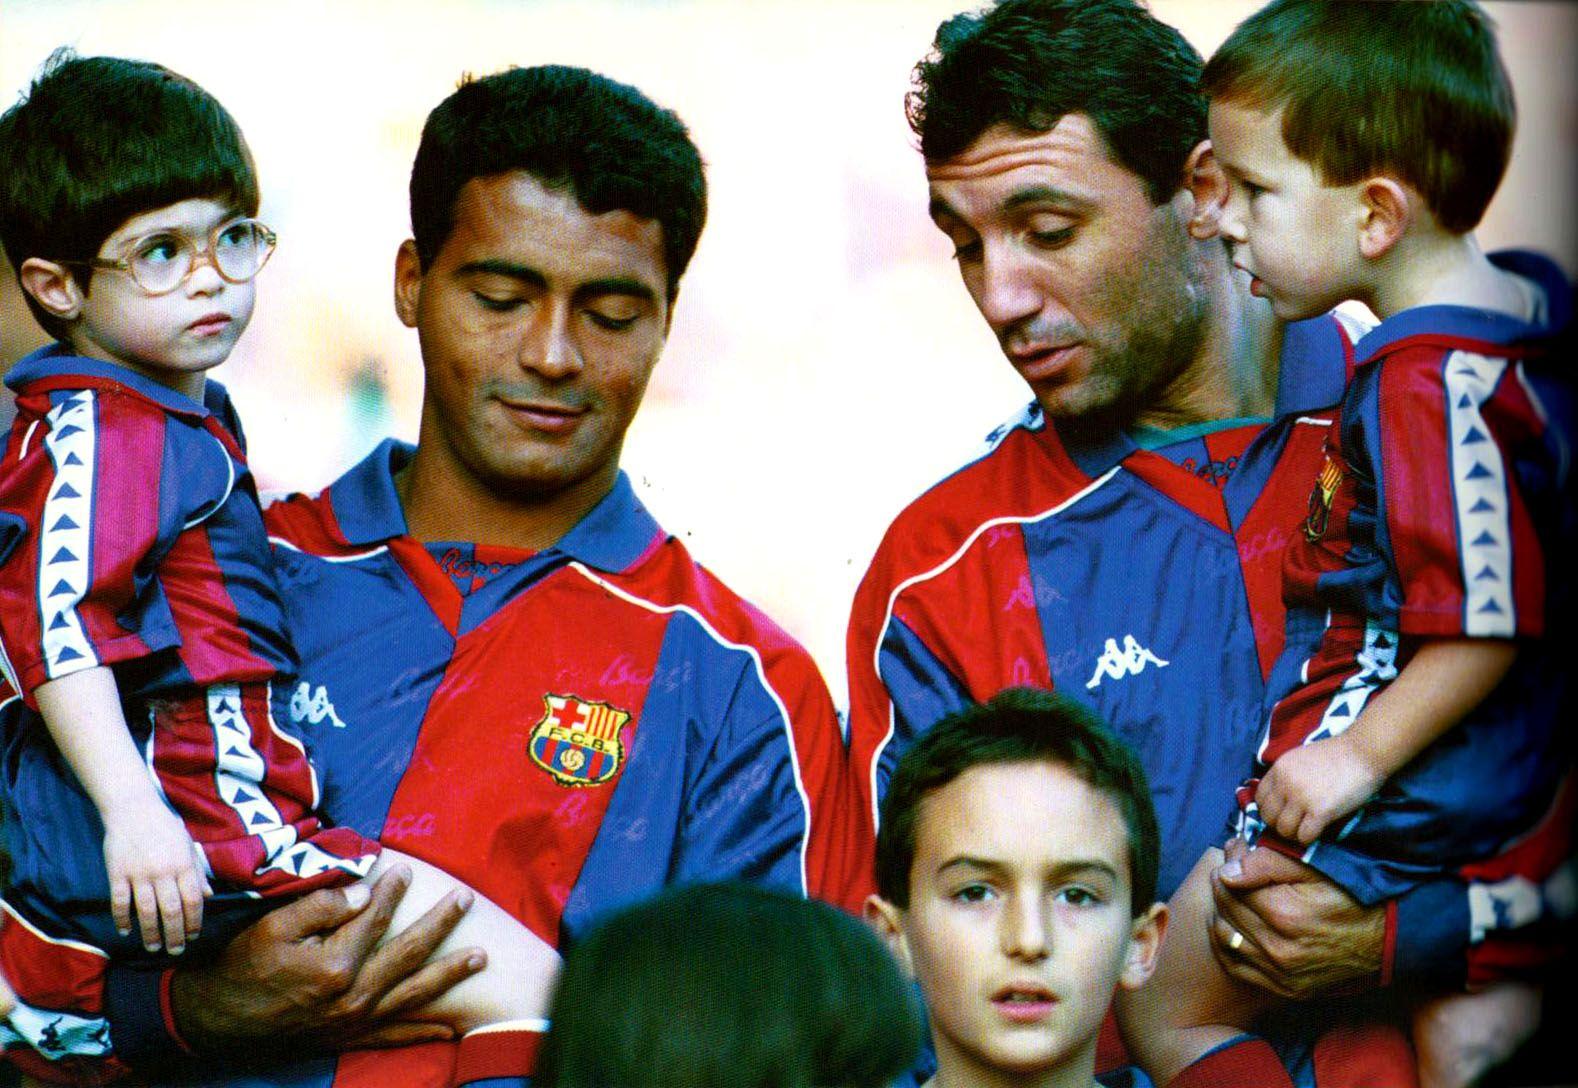 Romario i Stoichkov amb un grup de nens